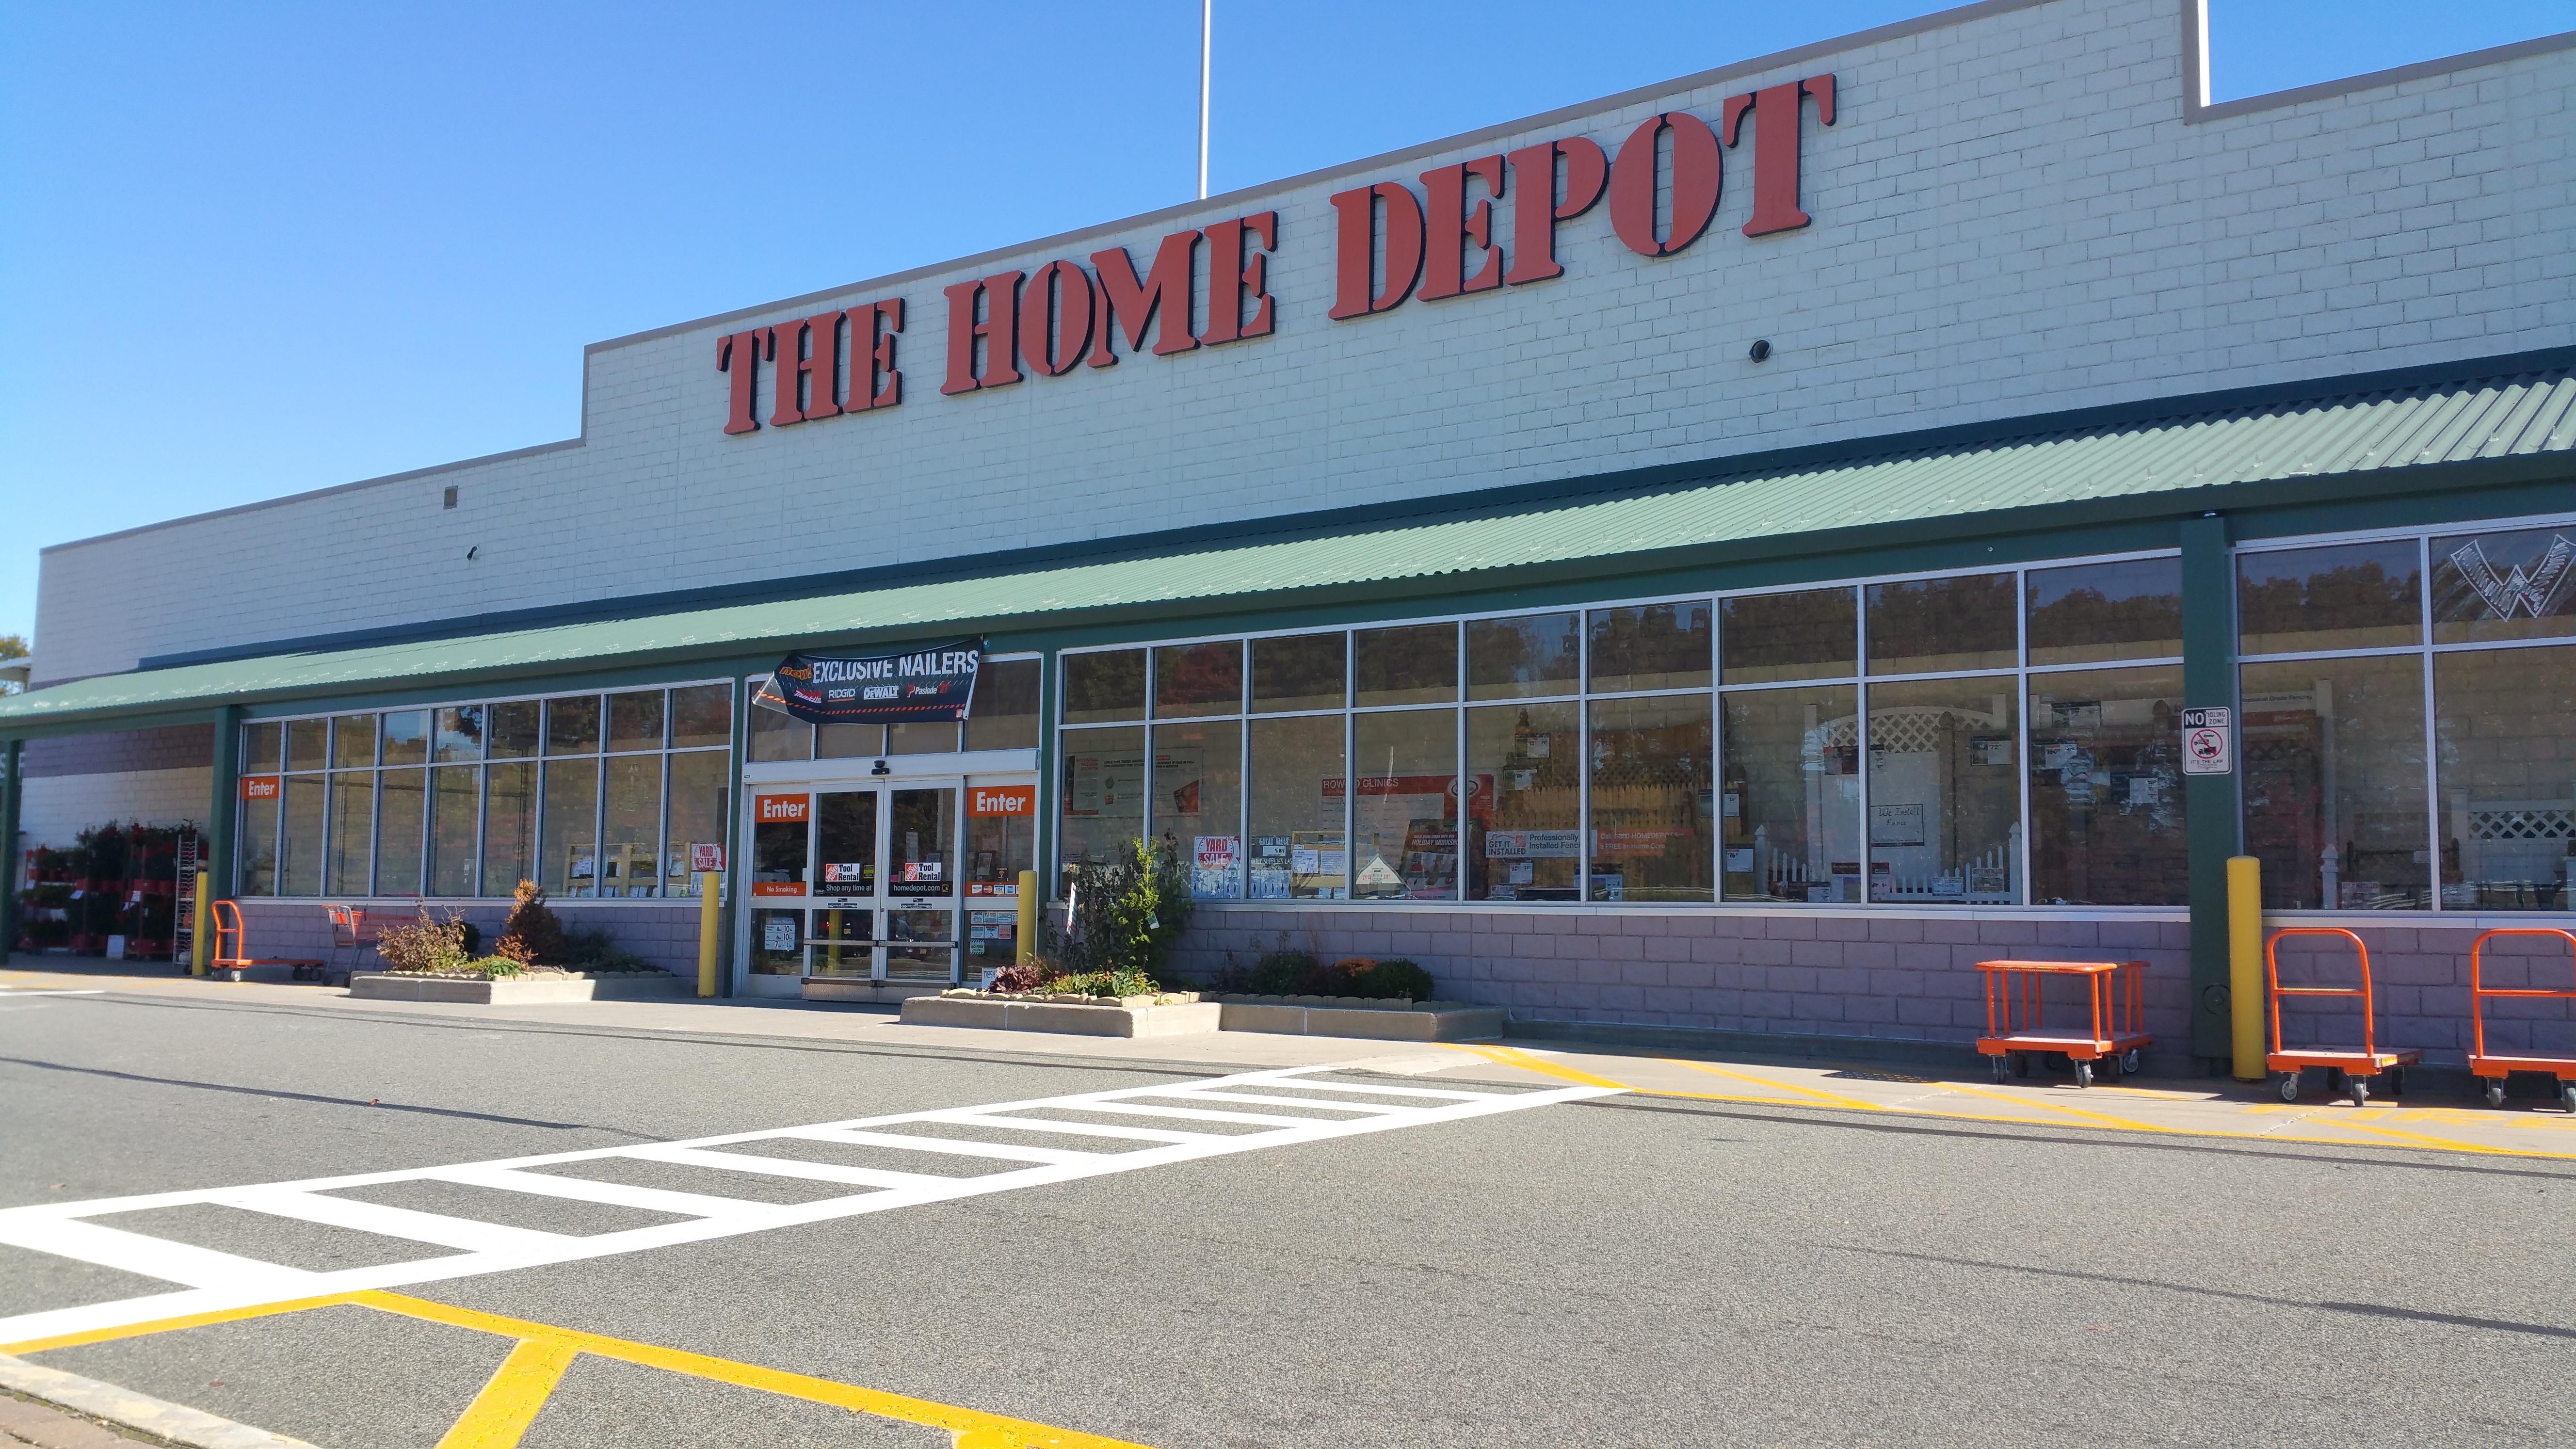 The Home Depot 79 Route 46 E Montville, NJ Hardware Stores